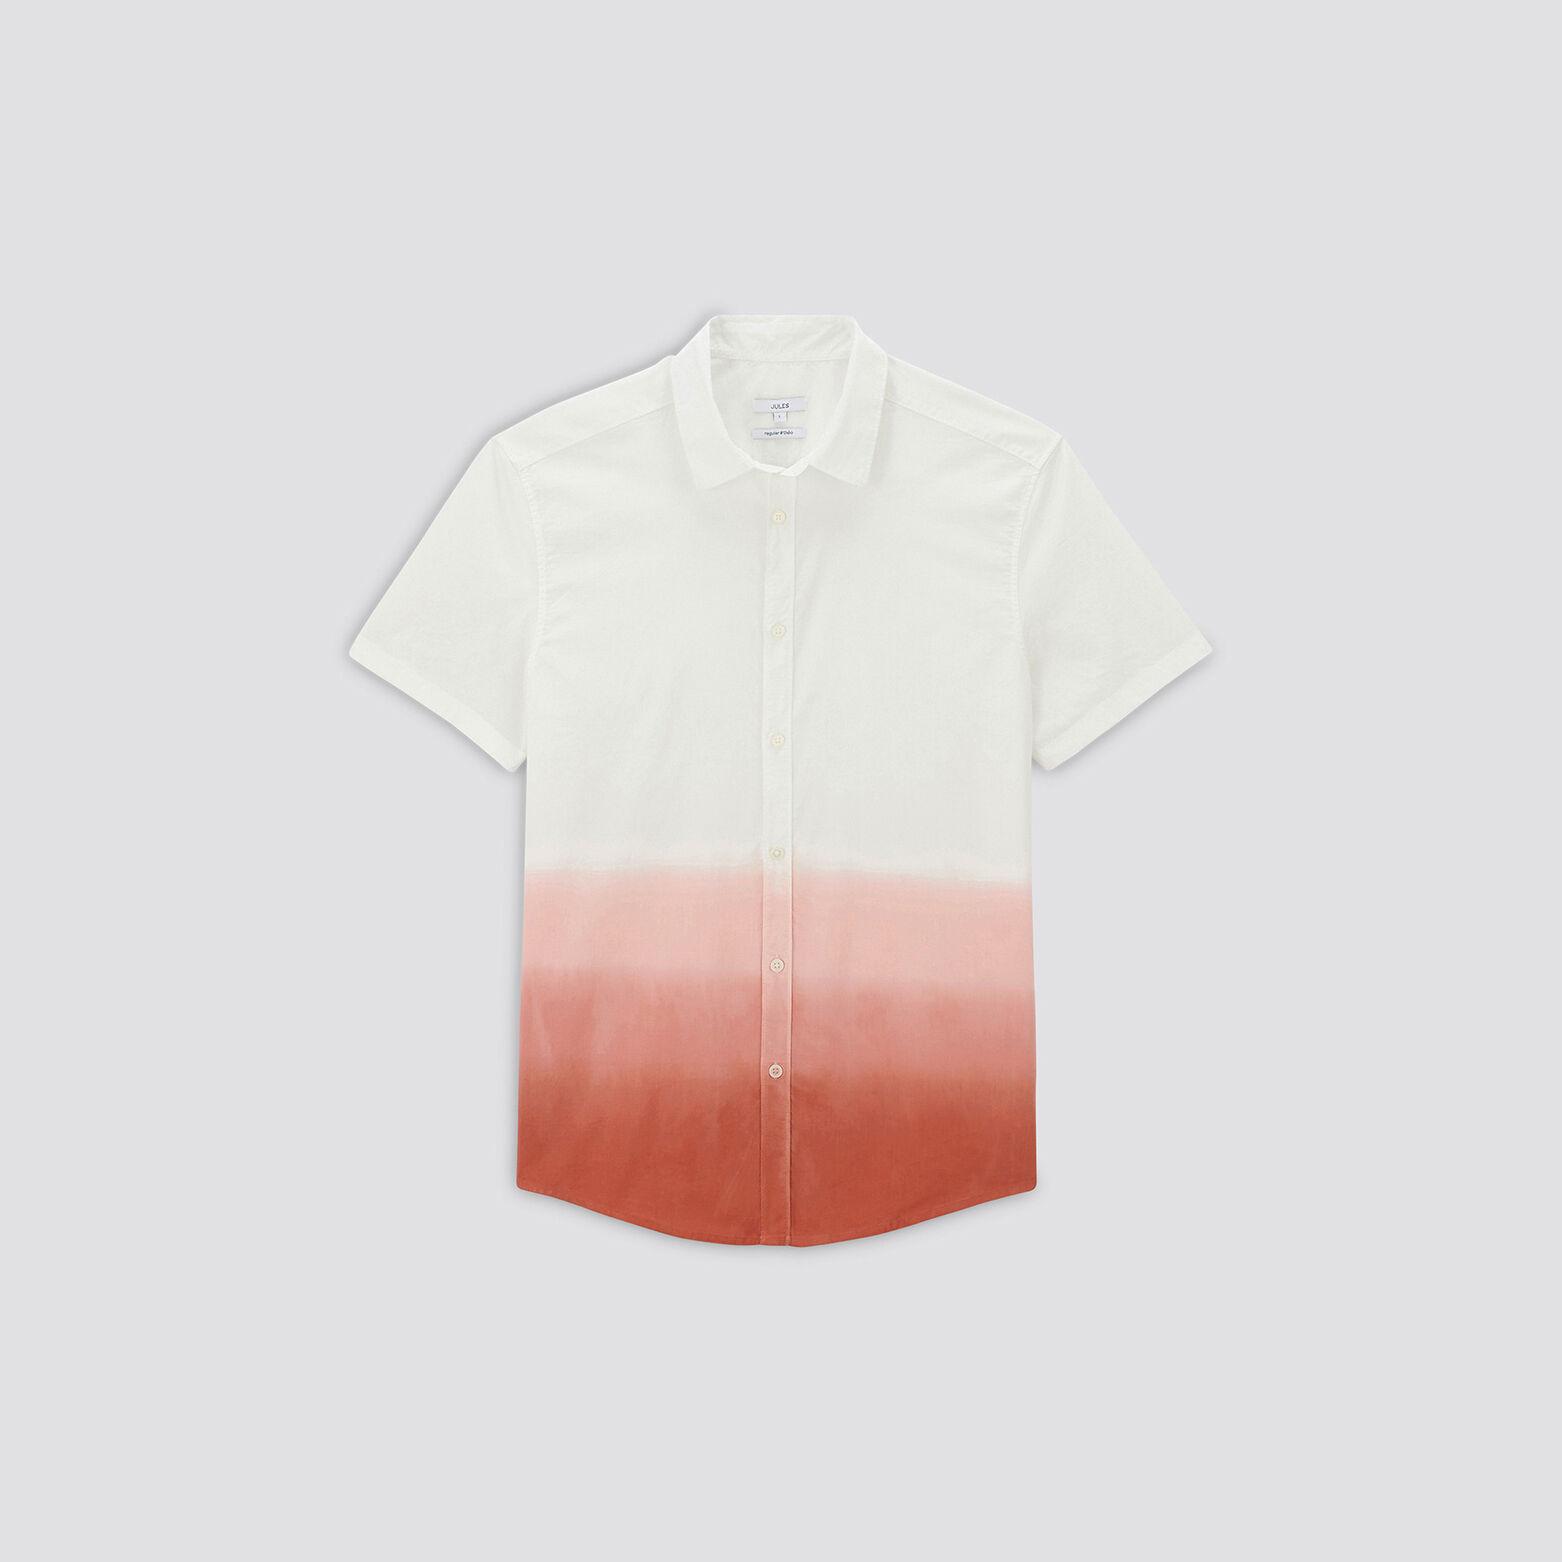 Chemisette regular effet tie and dye coton